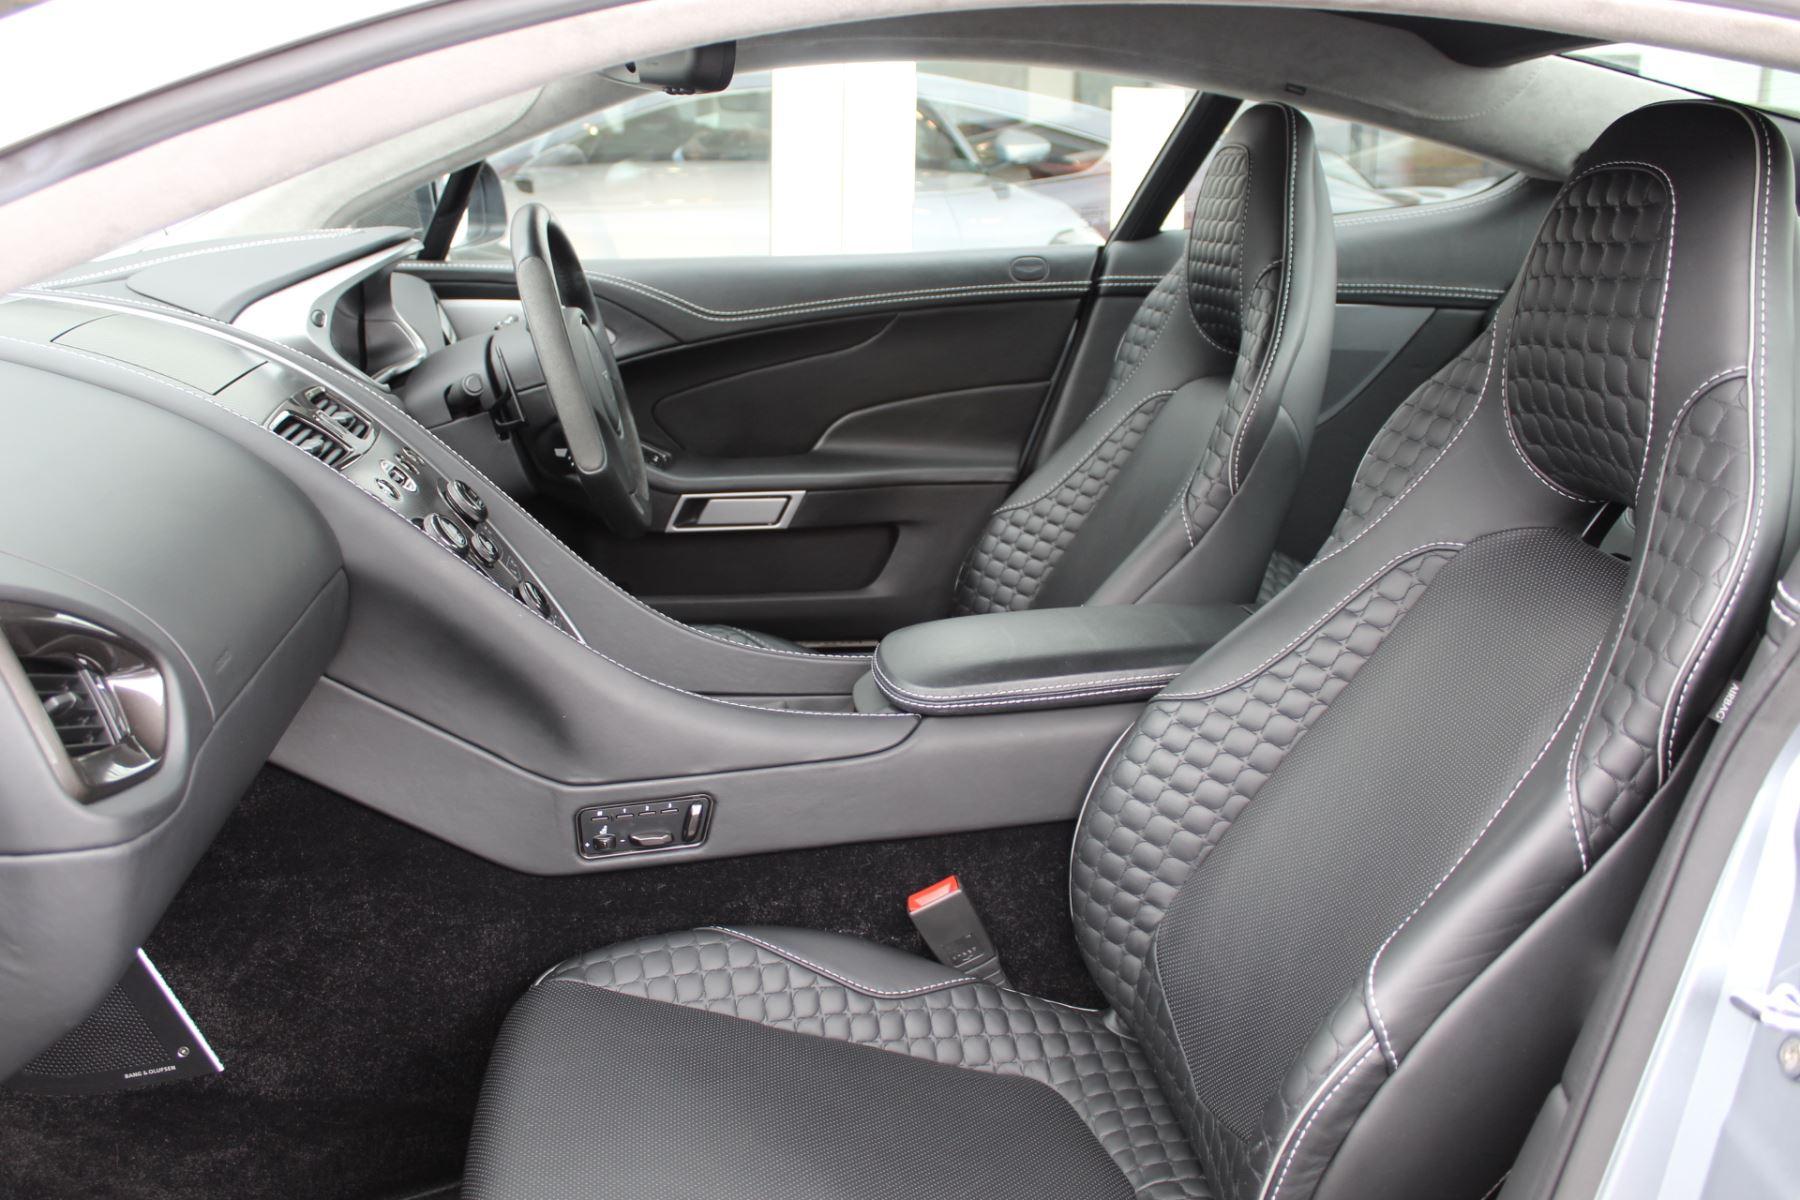 Aston Martin Vanquish V12 2+2 2dr Touchtronic image 16